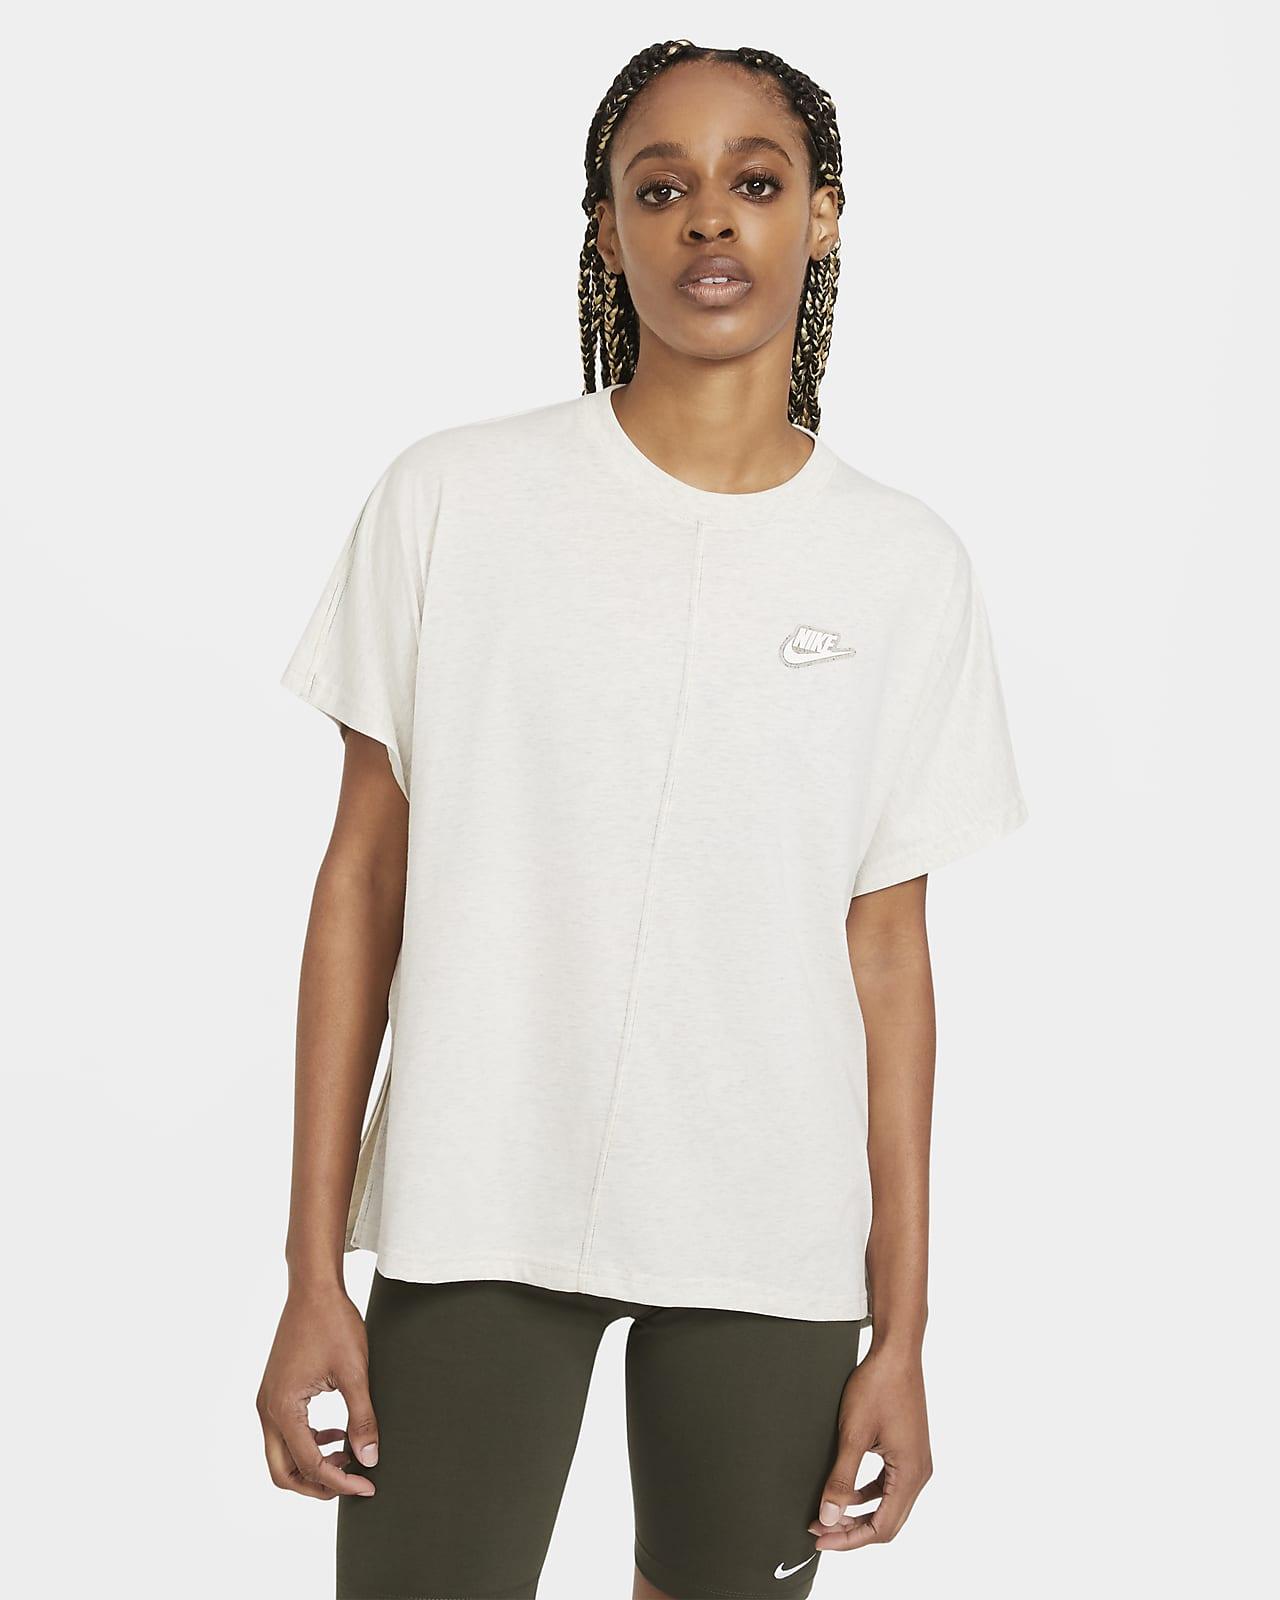 Nike Sportswear rövid ujjú női felső